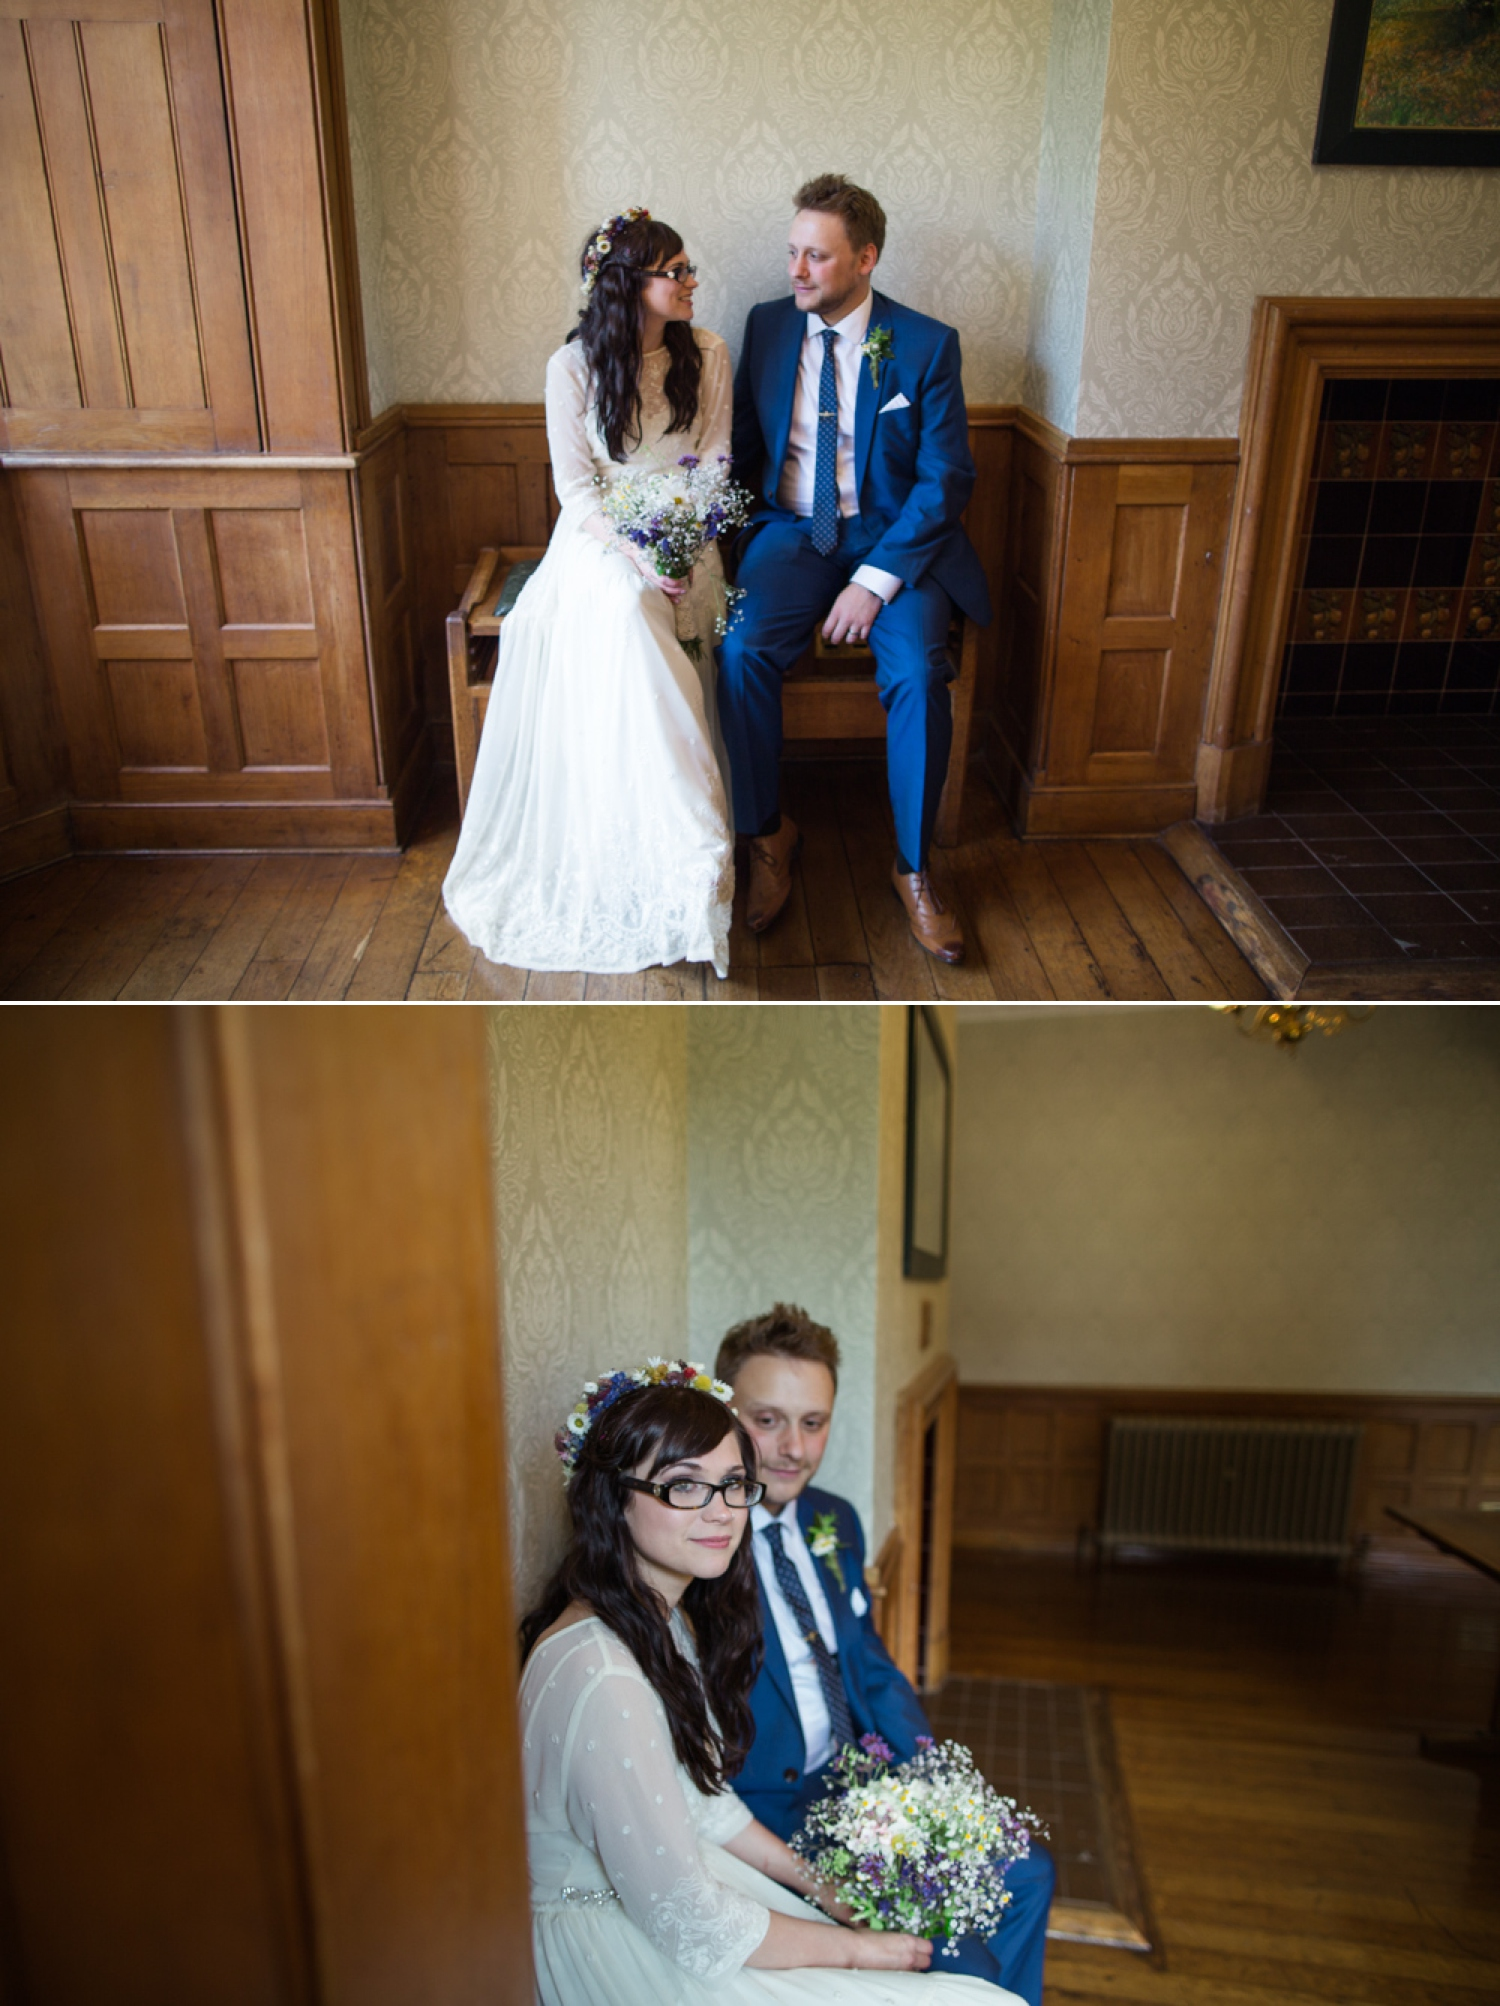 Cheshire Wedding Photographer Elly & Liam_0021